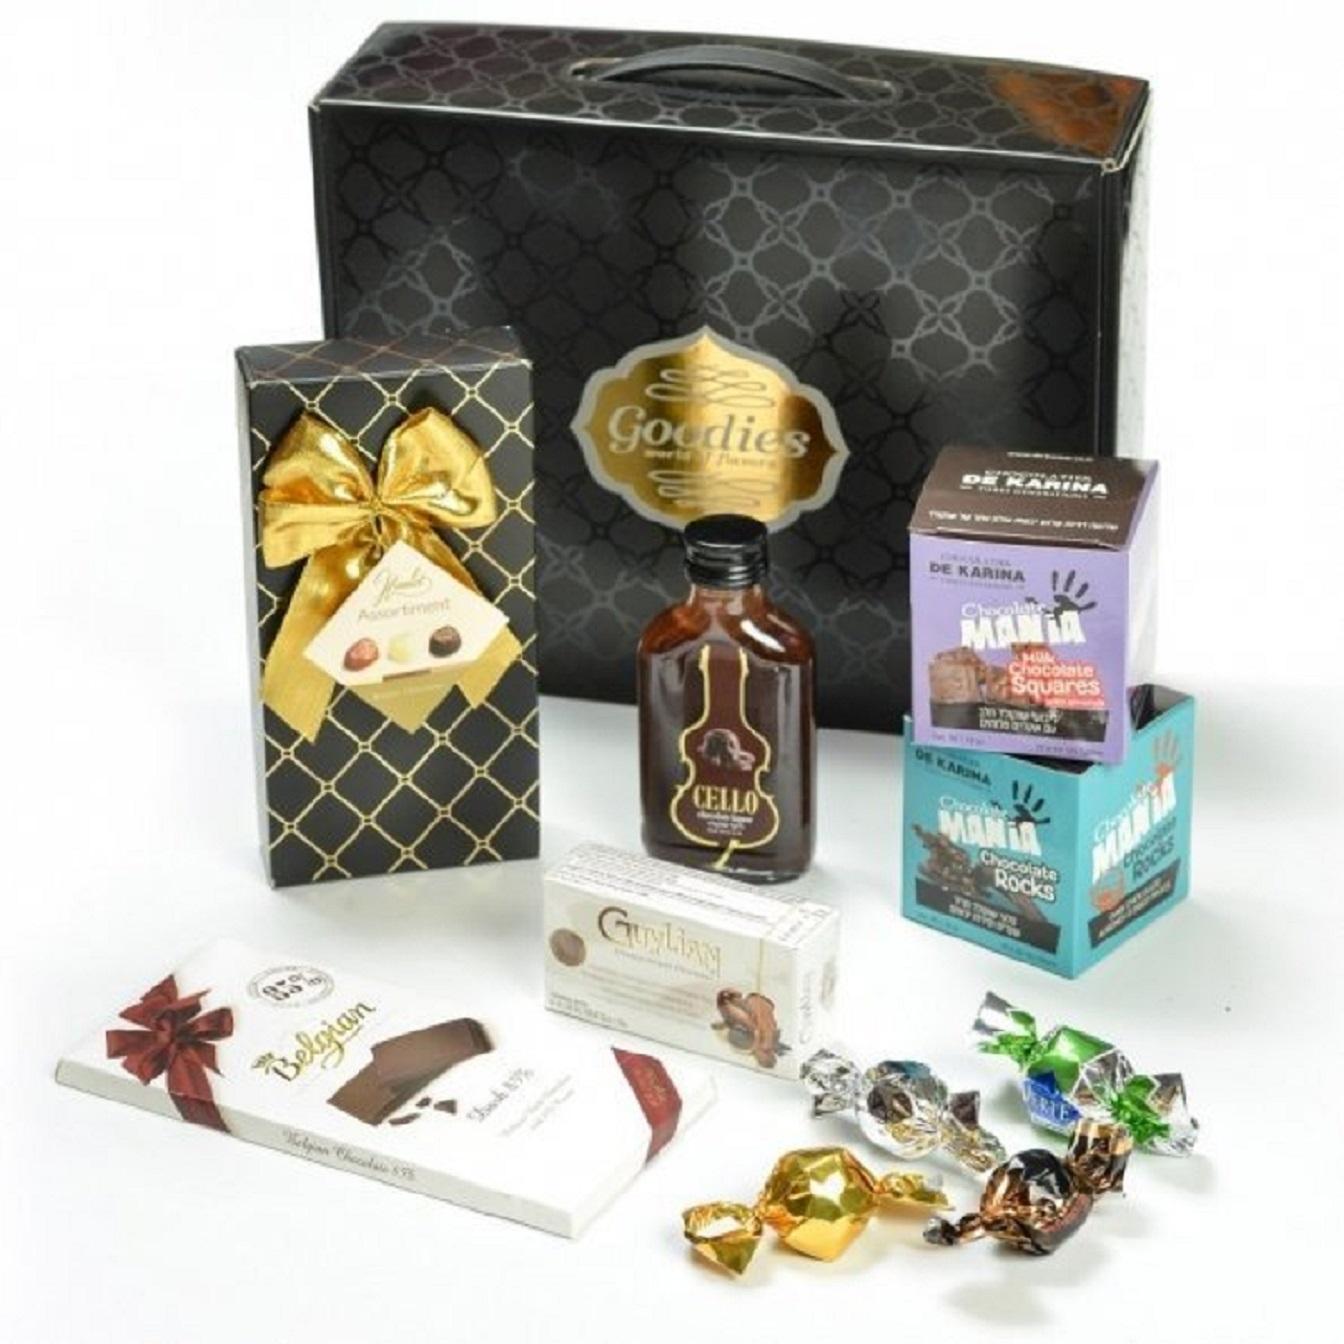 Elegant box of chocolates